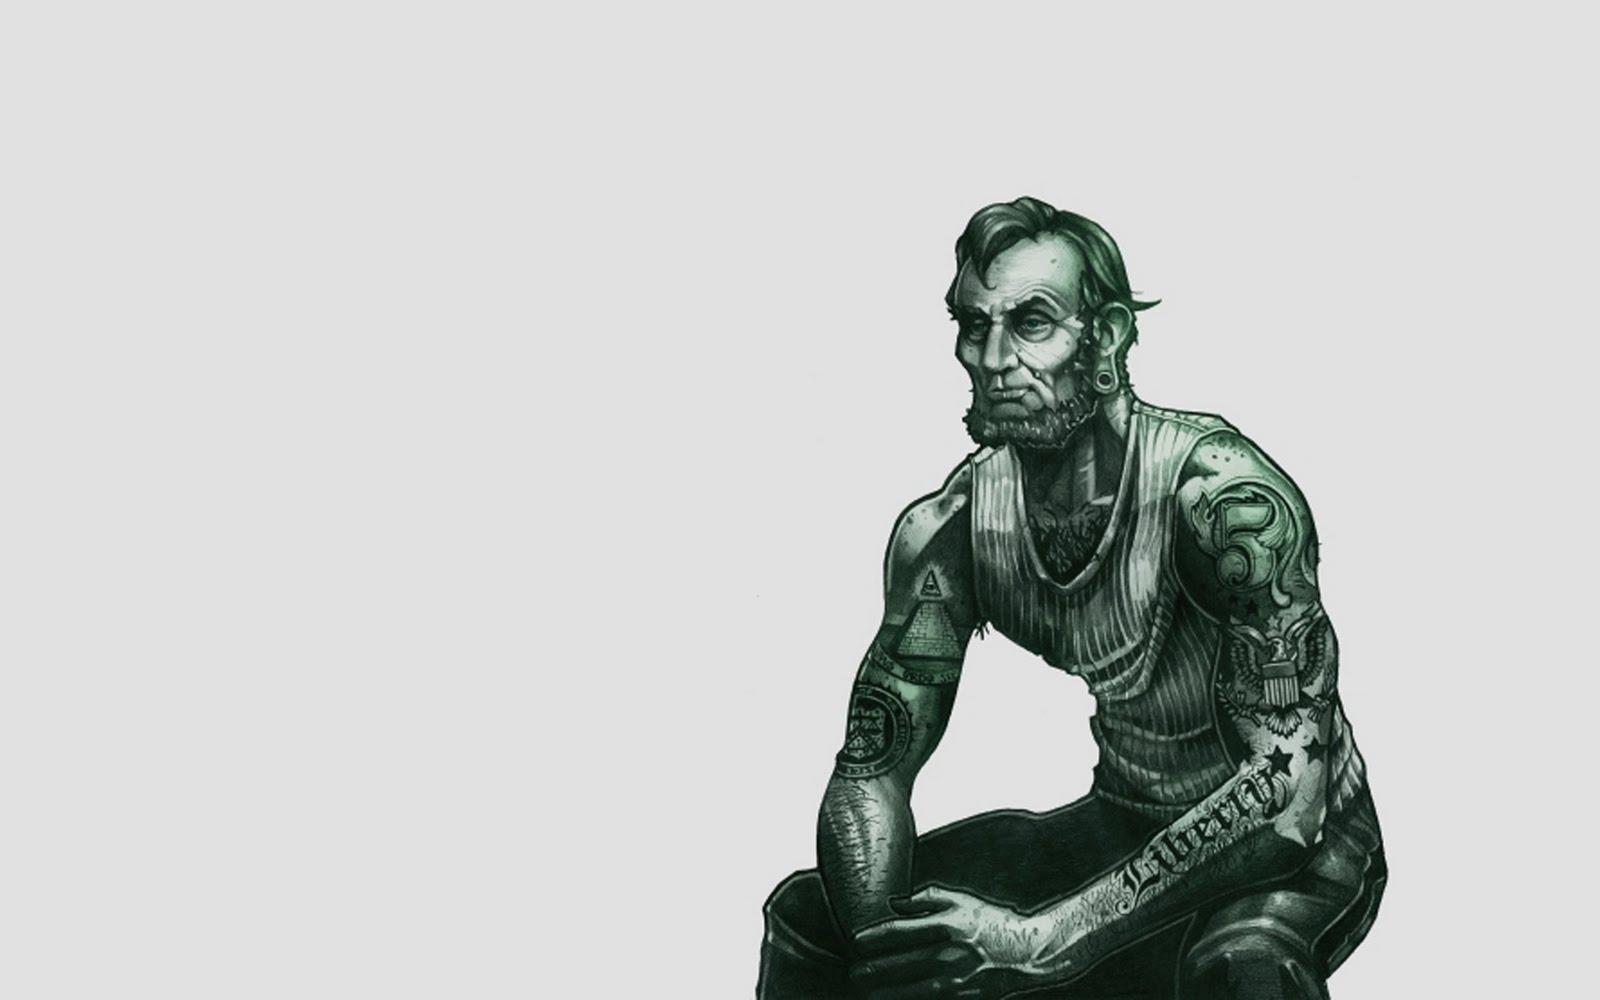 Abe Lincoln Wallpaper 1600x1000